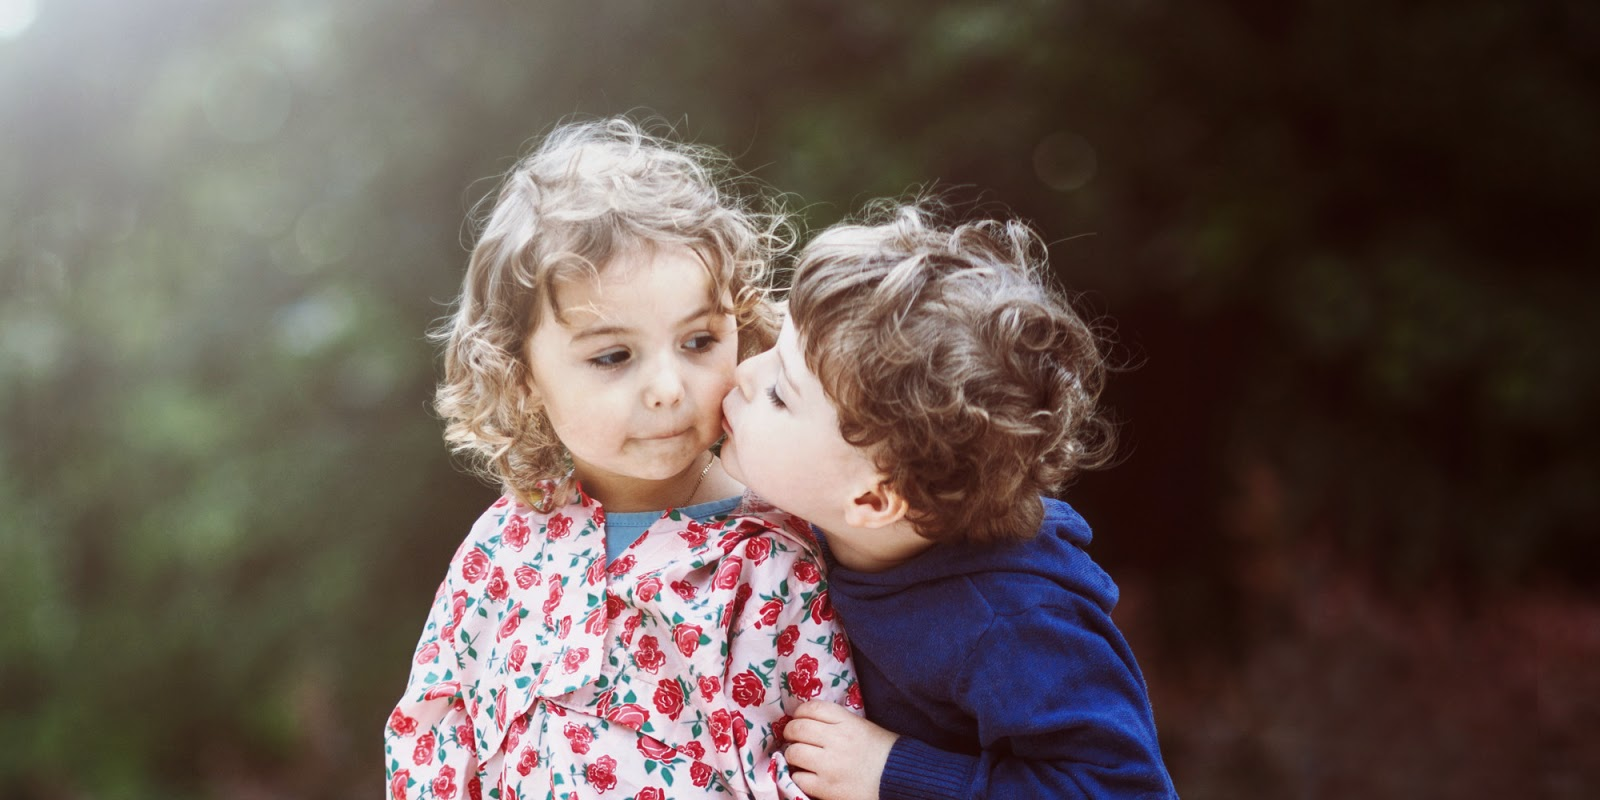 Gambar lucu dan romantis bayi-bayi berciuman